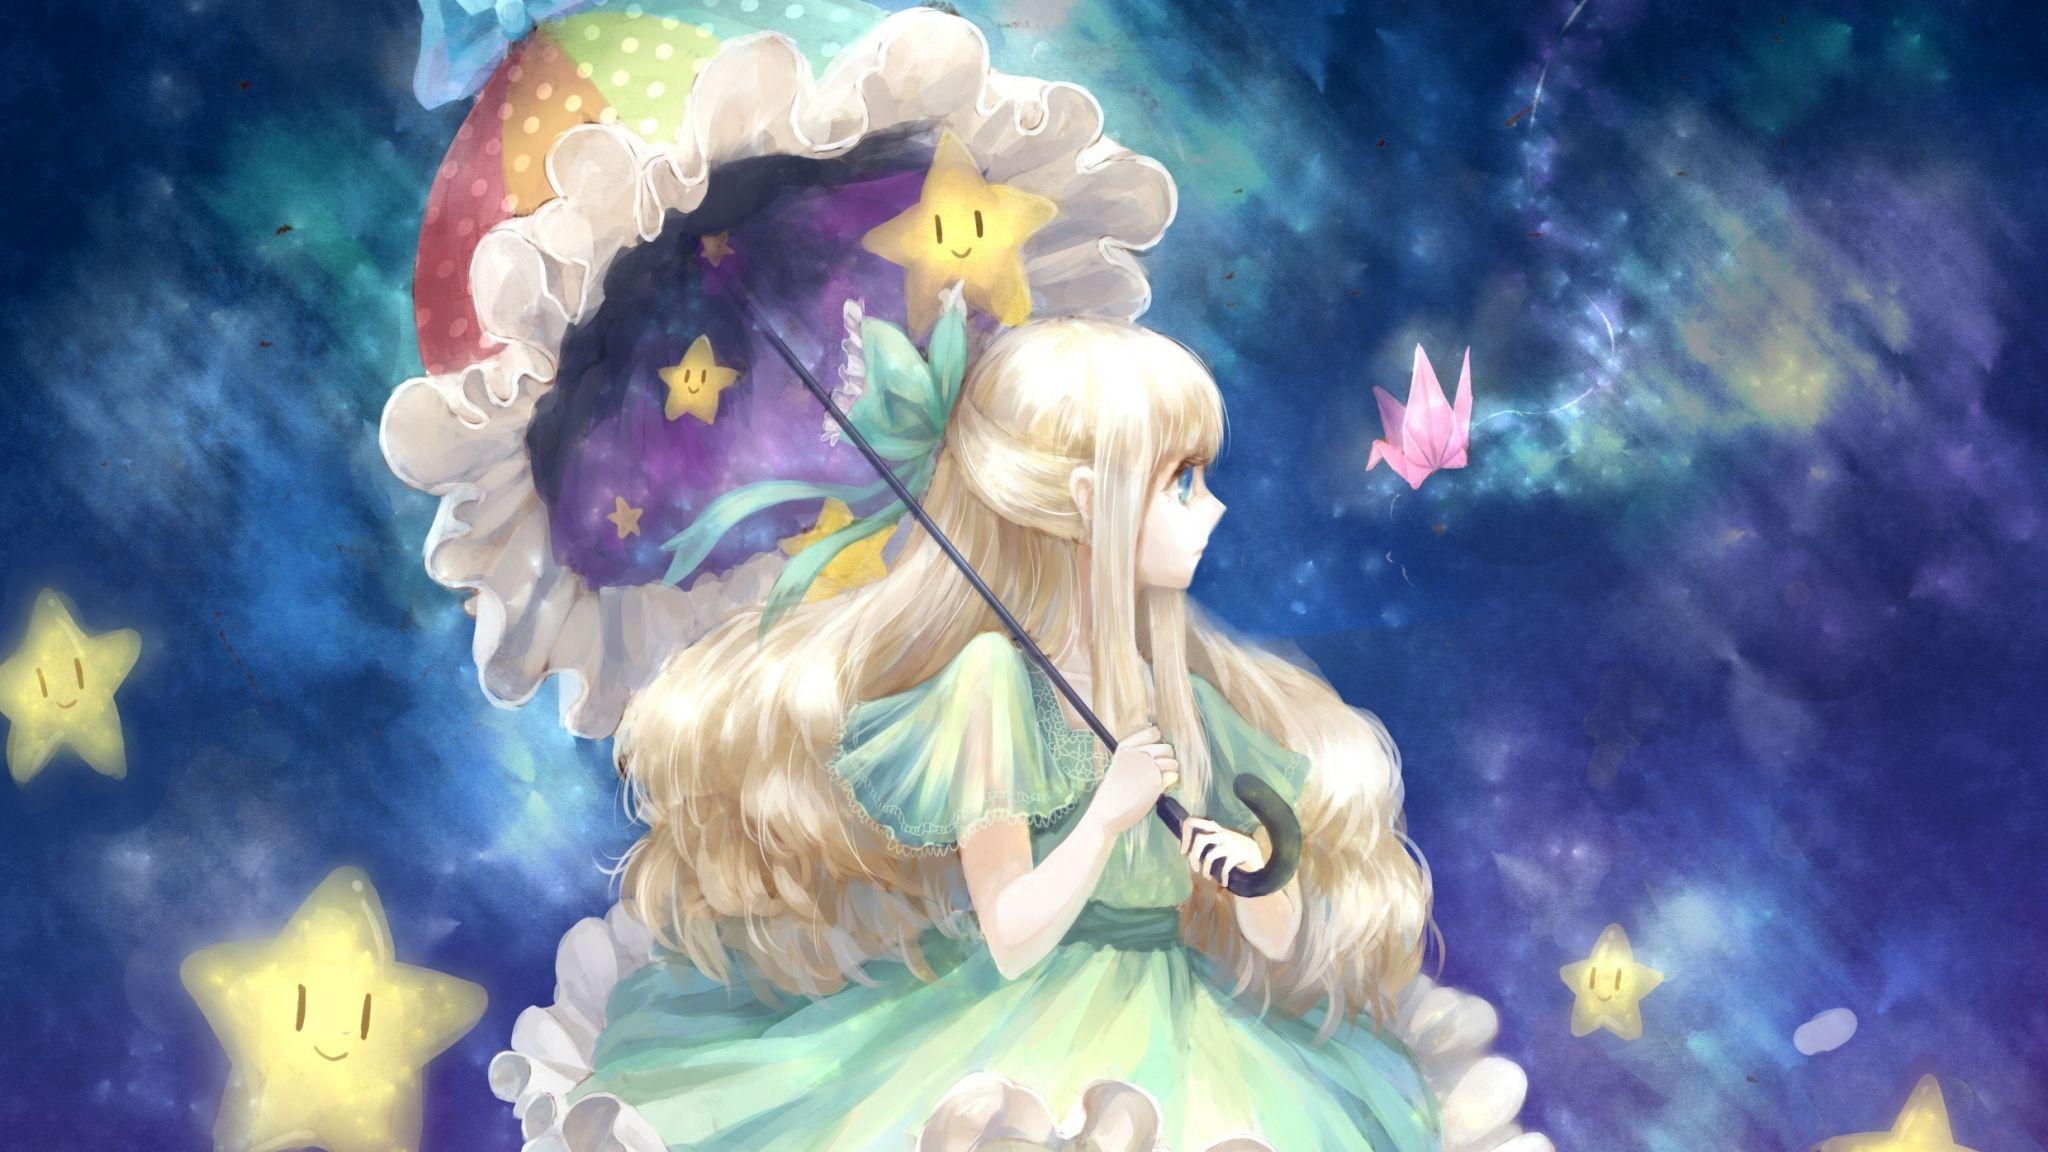 Girl Anime Art Umbrella 104966 2048x1152 Jpg 2048 1152 Anime Wallpaper Japanese Cartoon Art Hd Anime Wallpapers